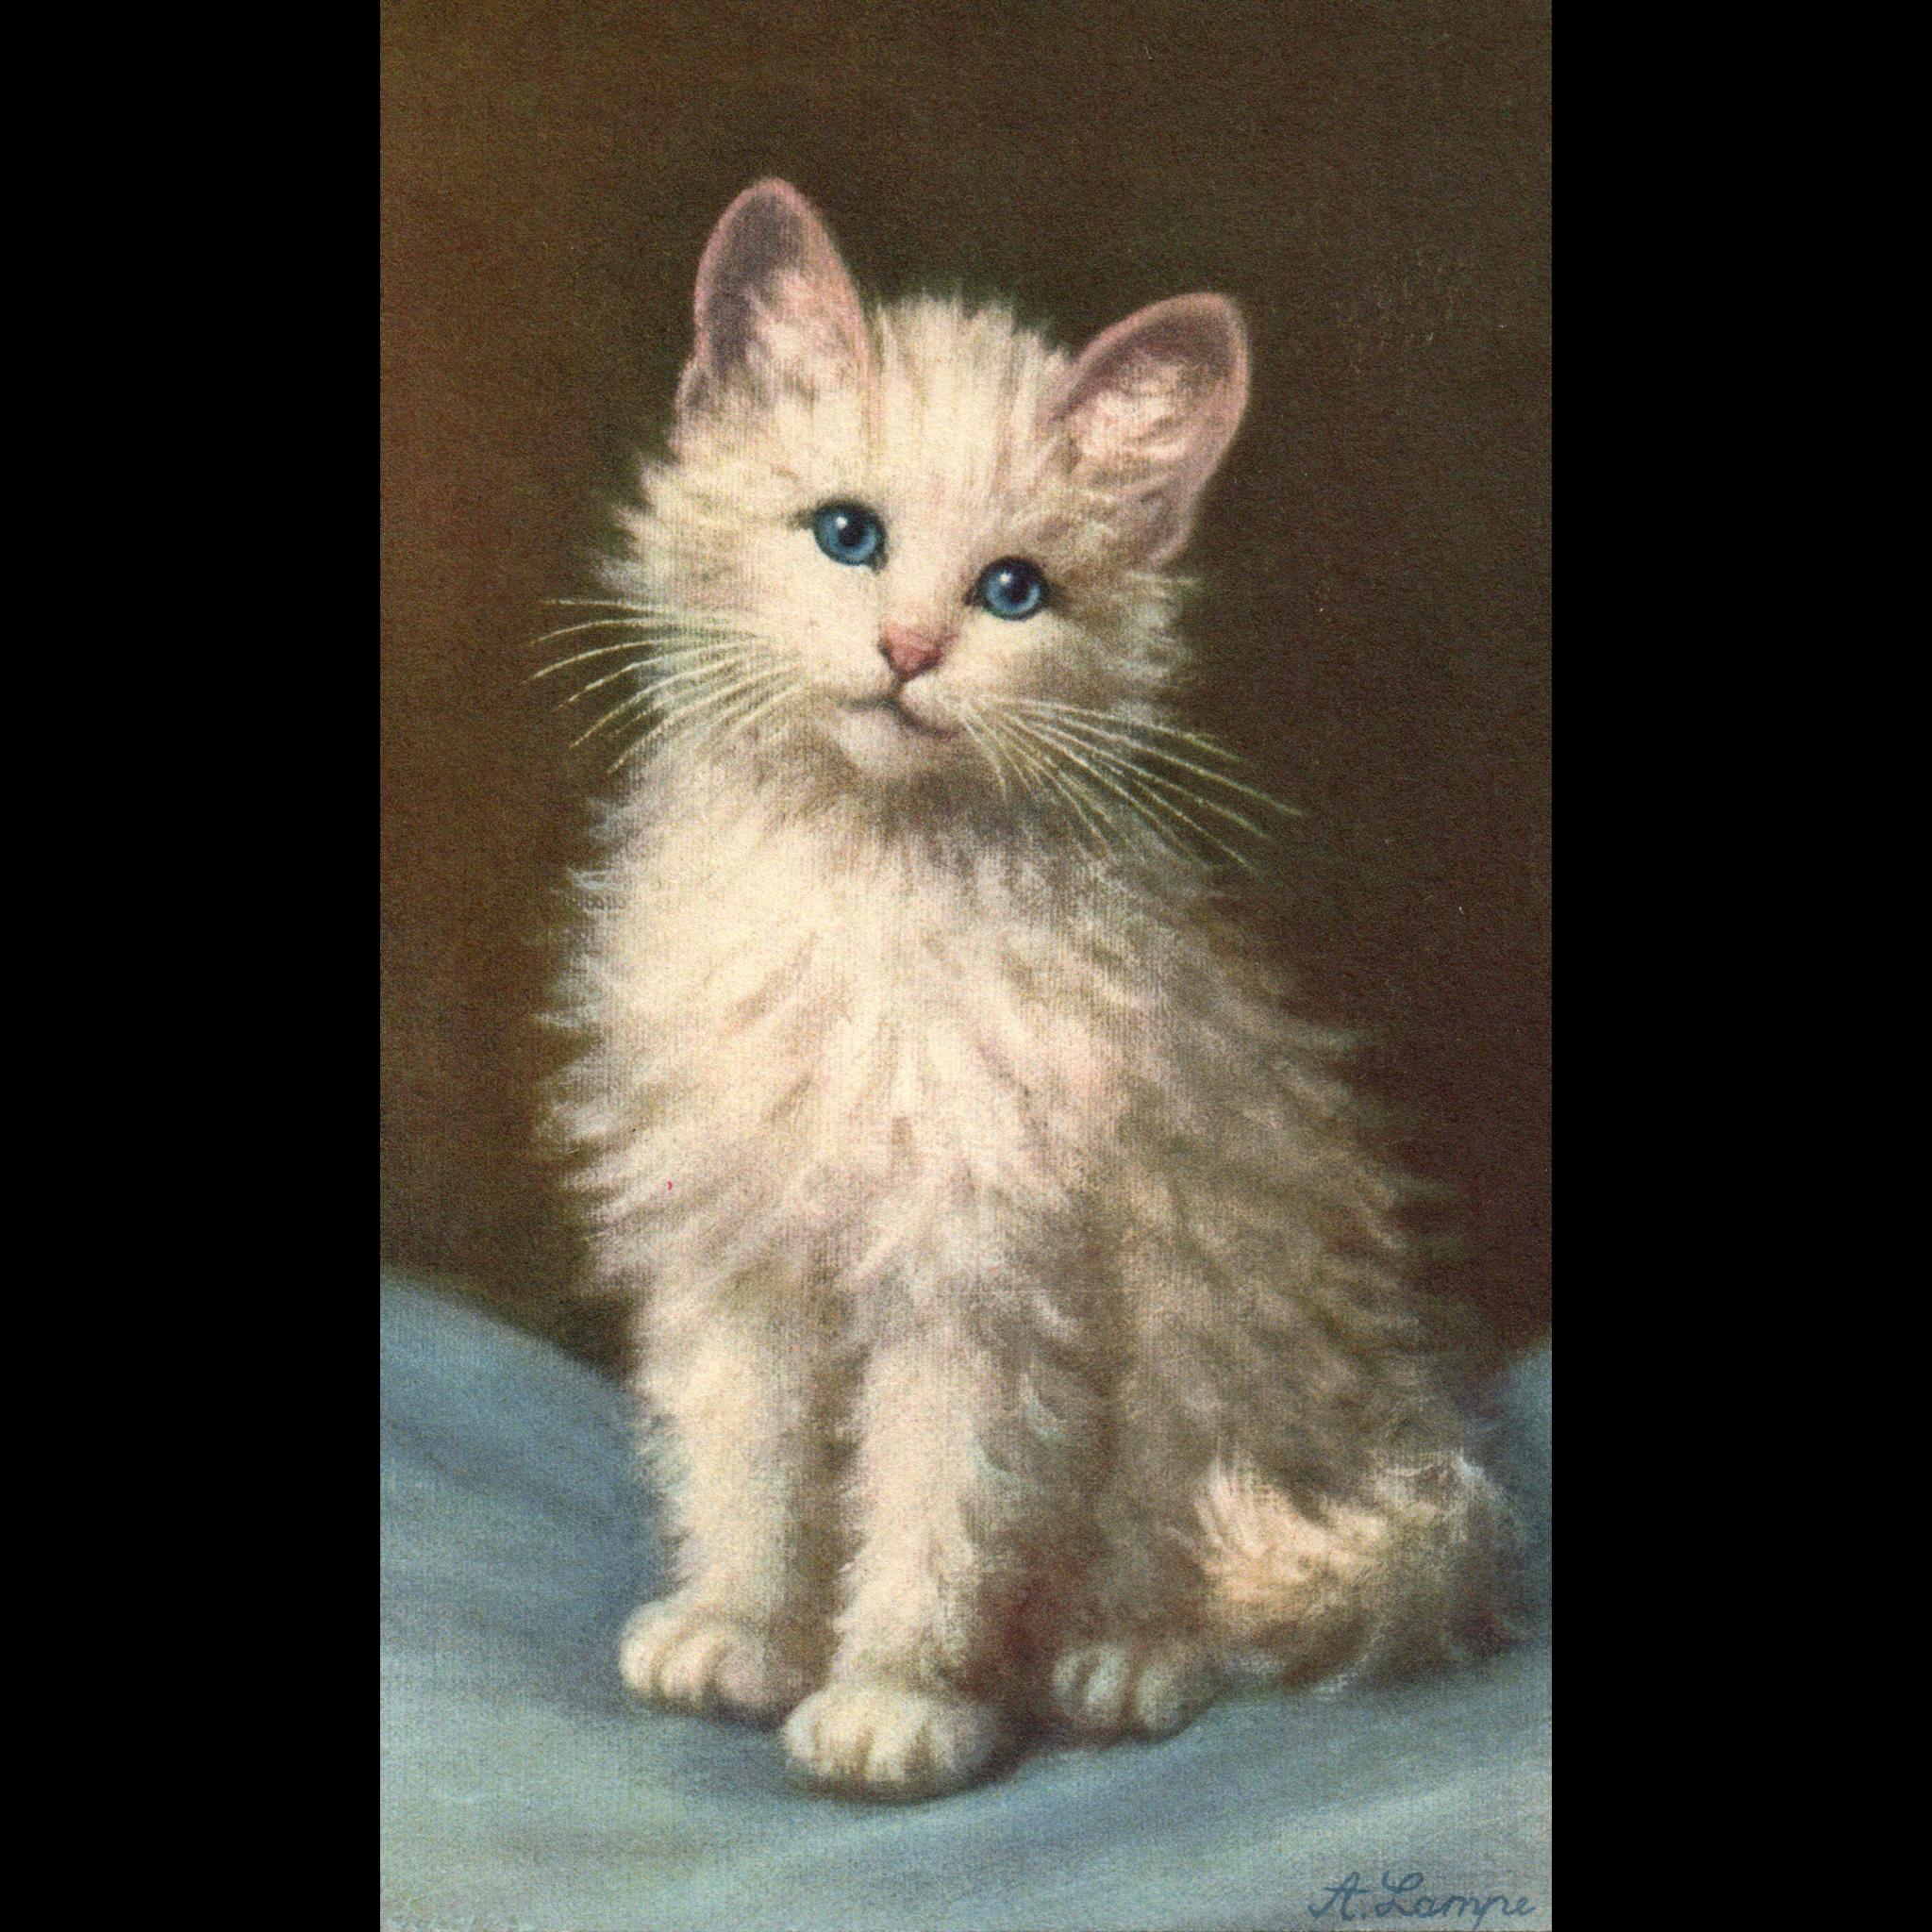 Artist Signed A Lampe White Kitten cat  #168